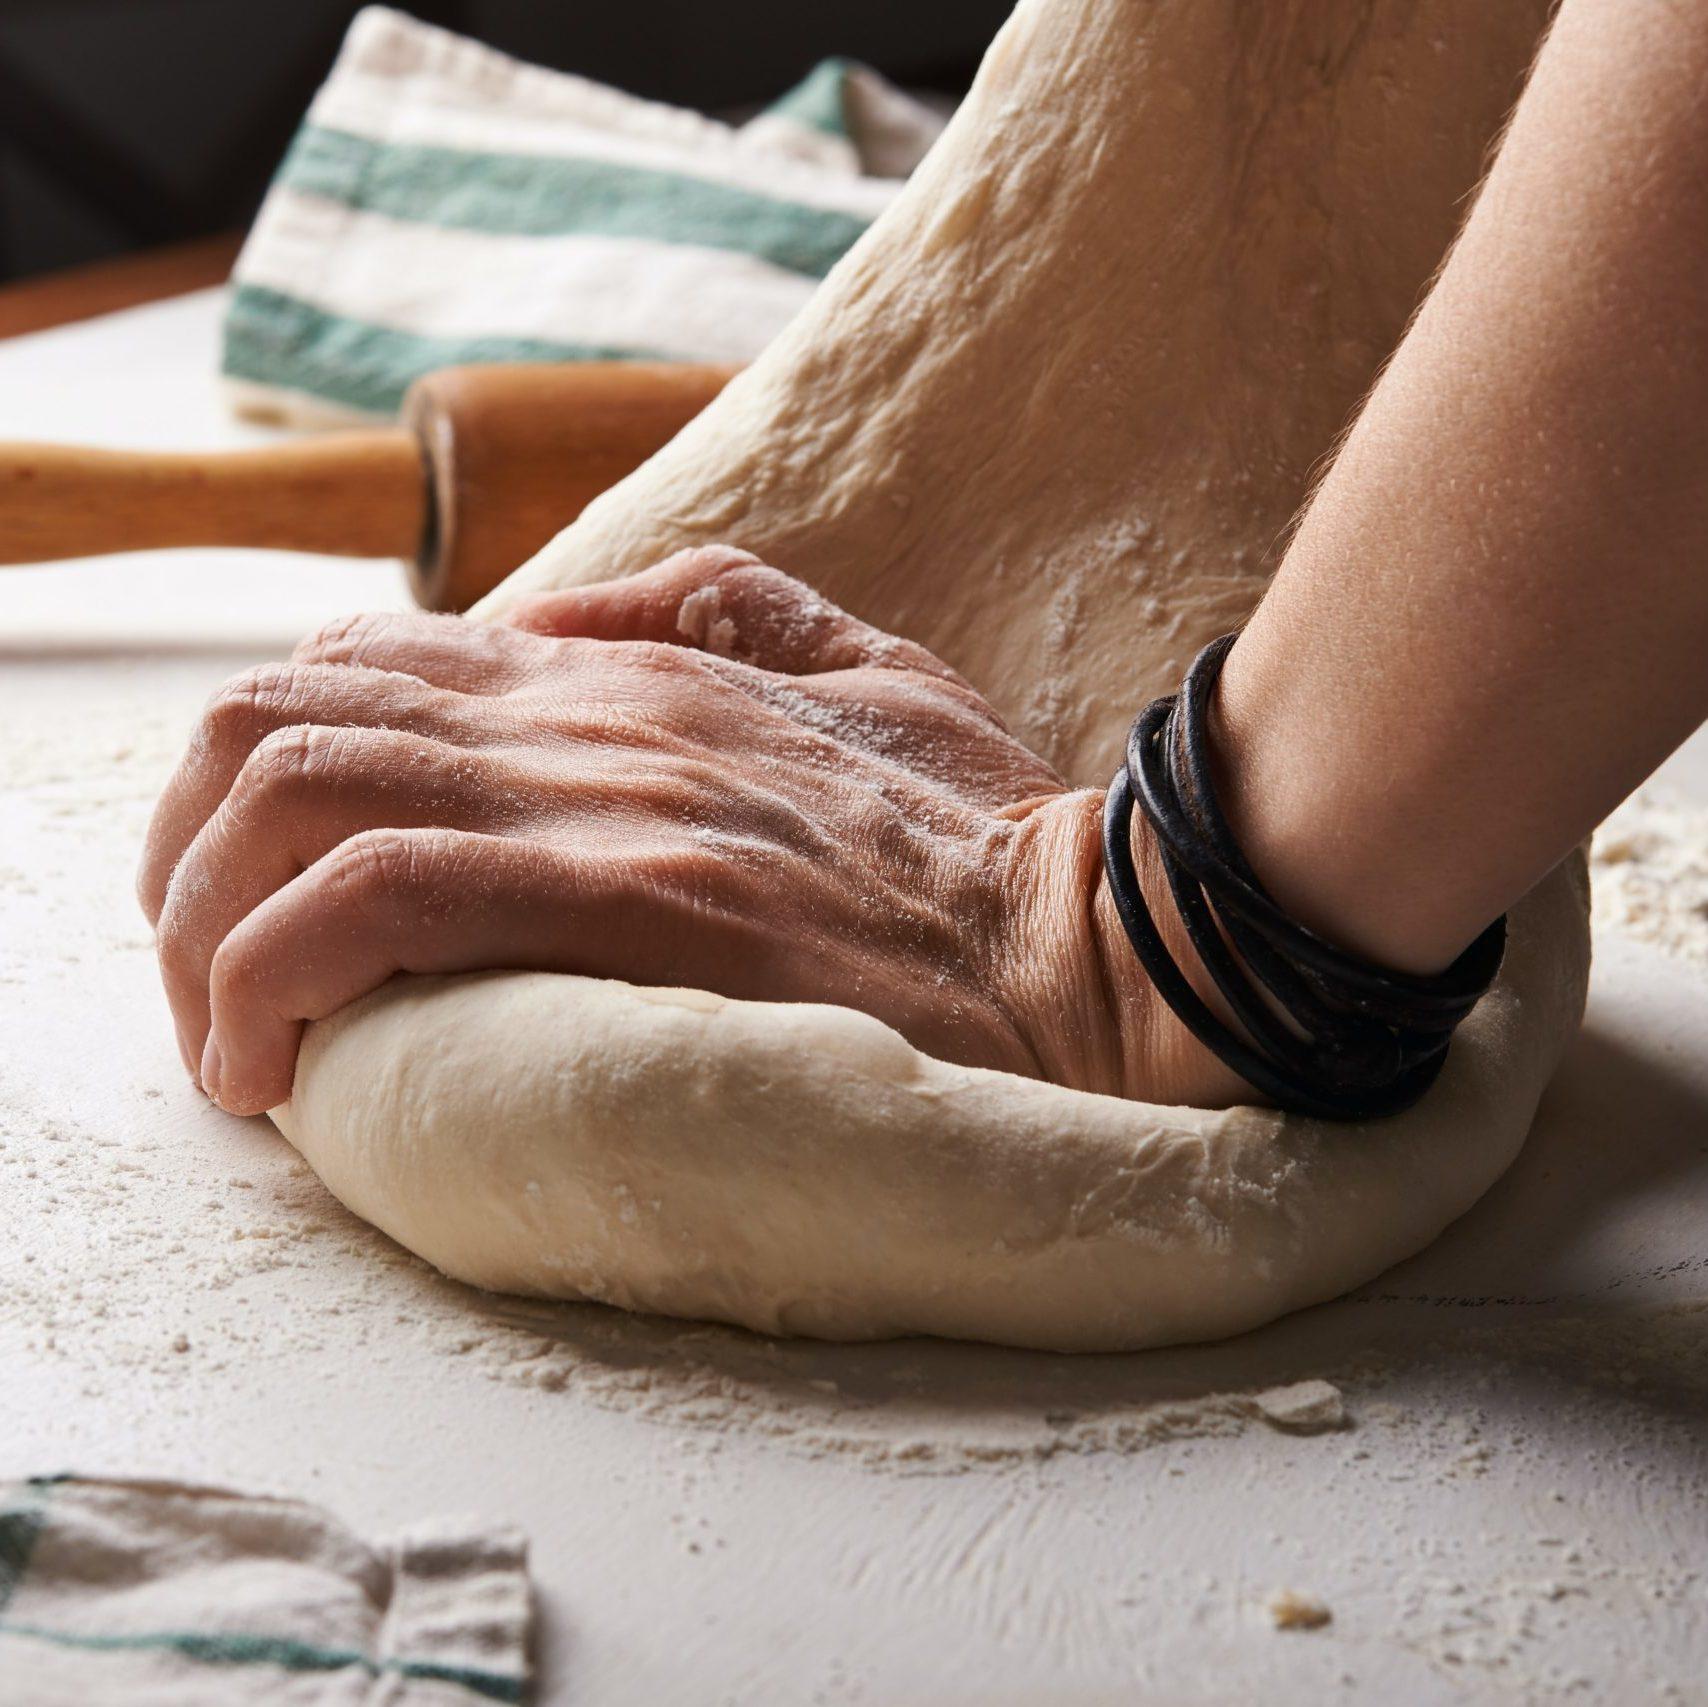 Hand kneading bread